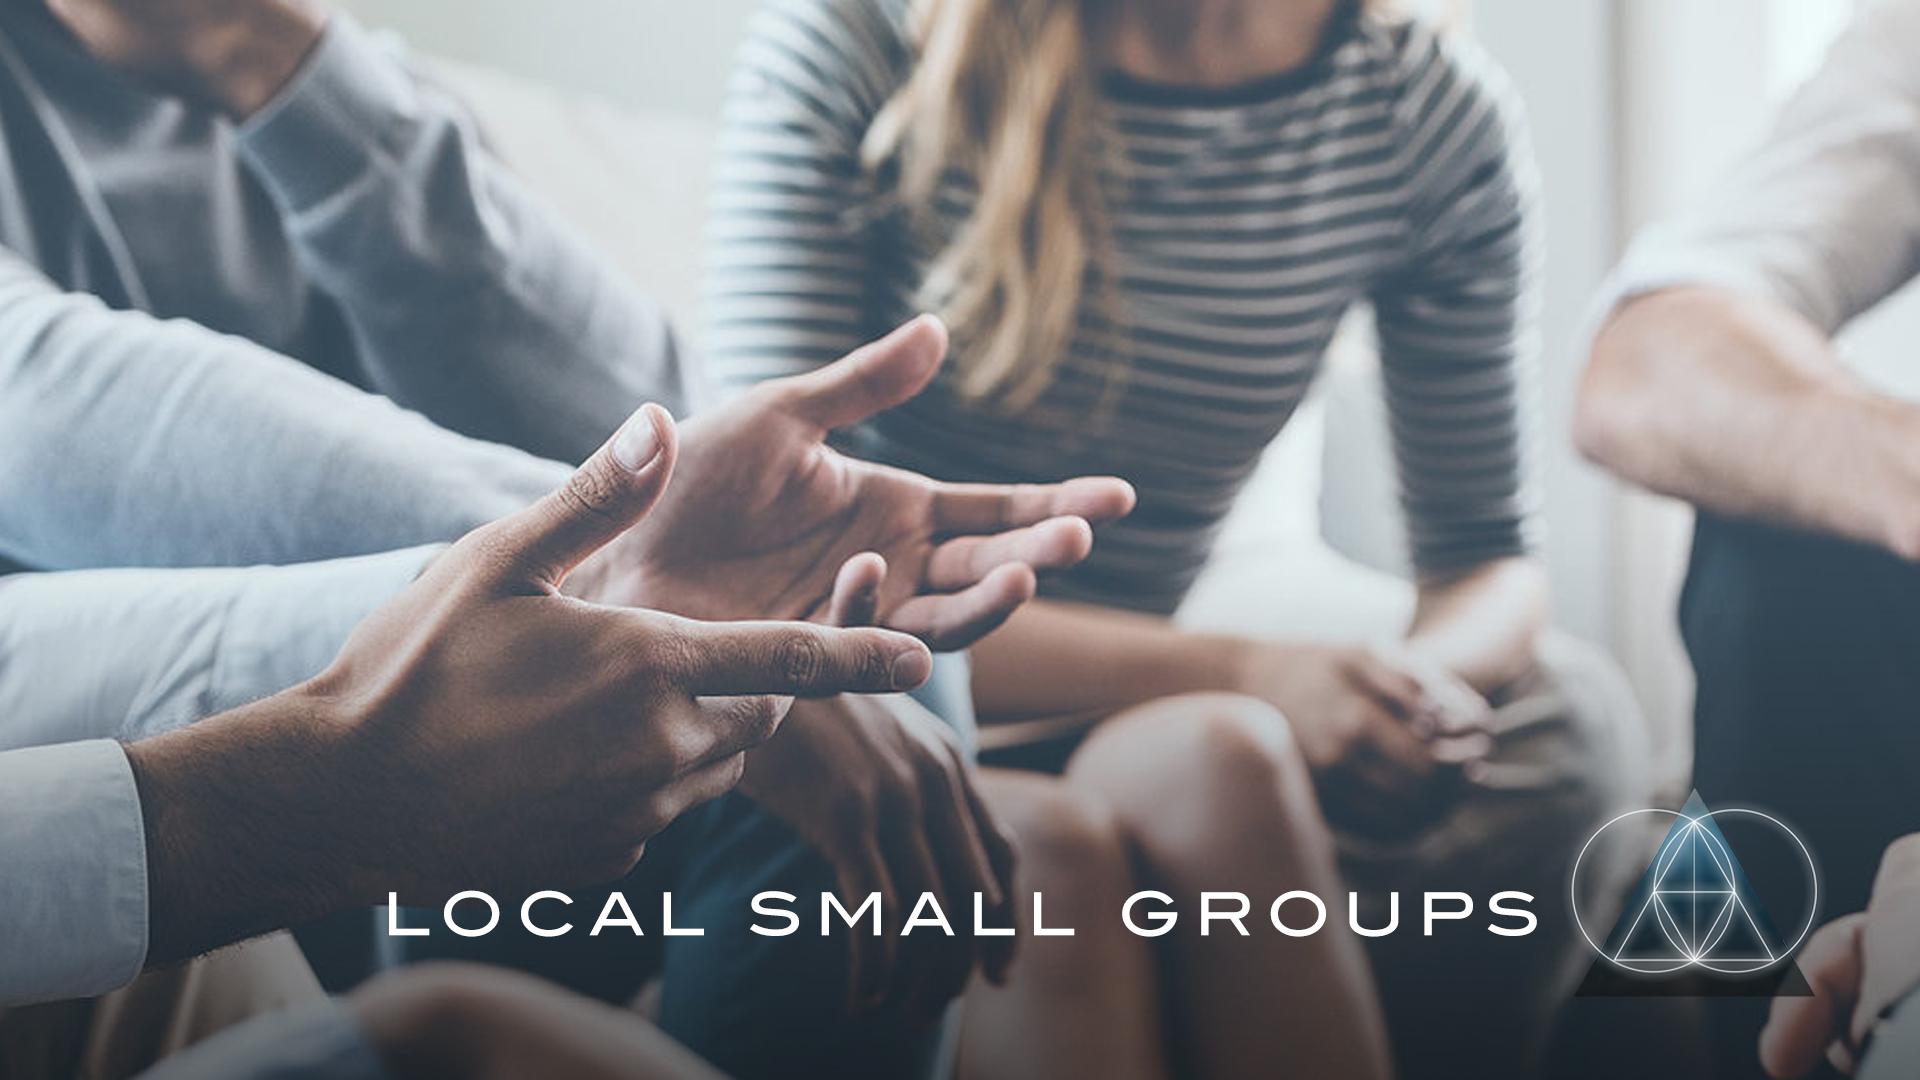 modern spirituality - local small groups